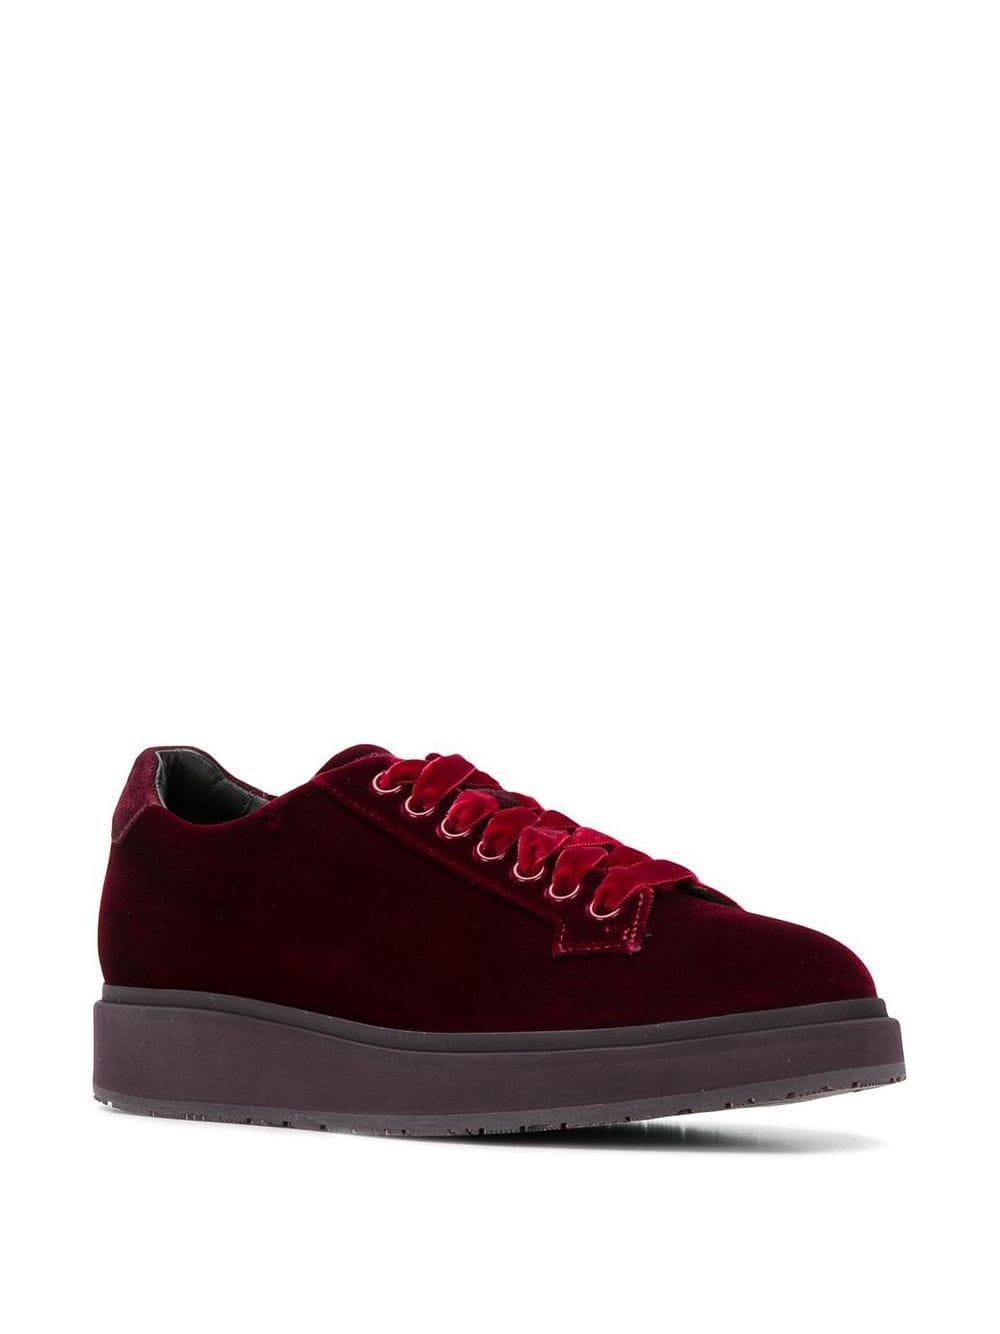 Santoni Velvet Lace-up Sneakers in Red